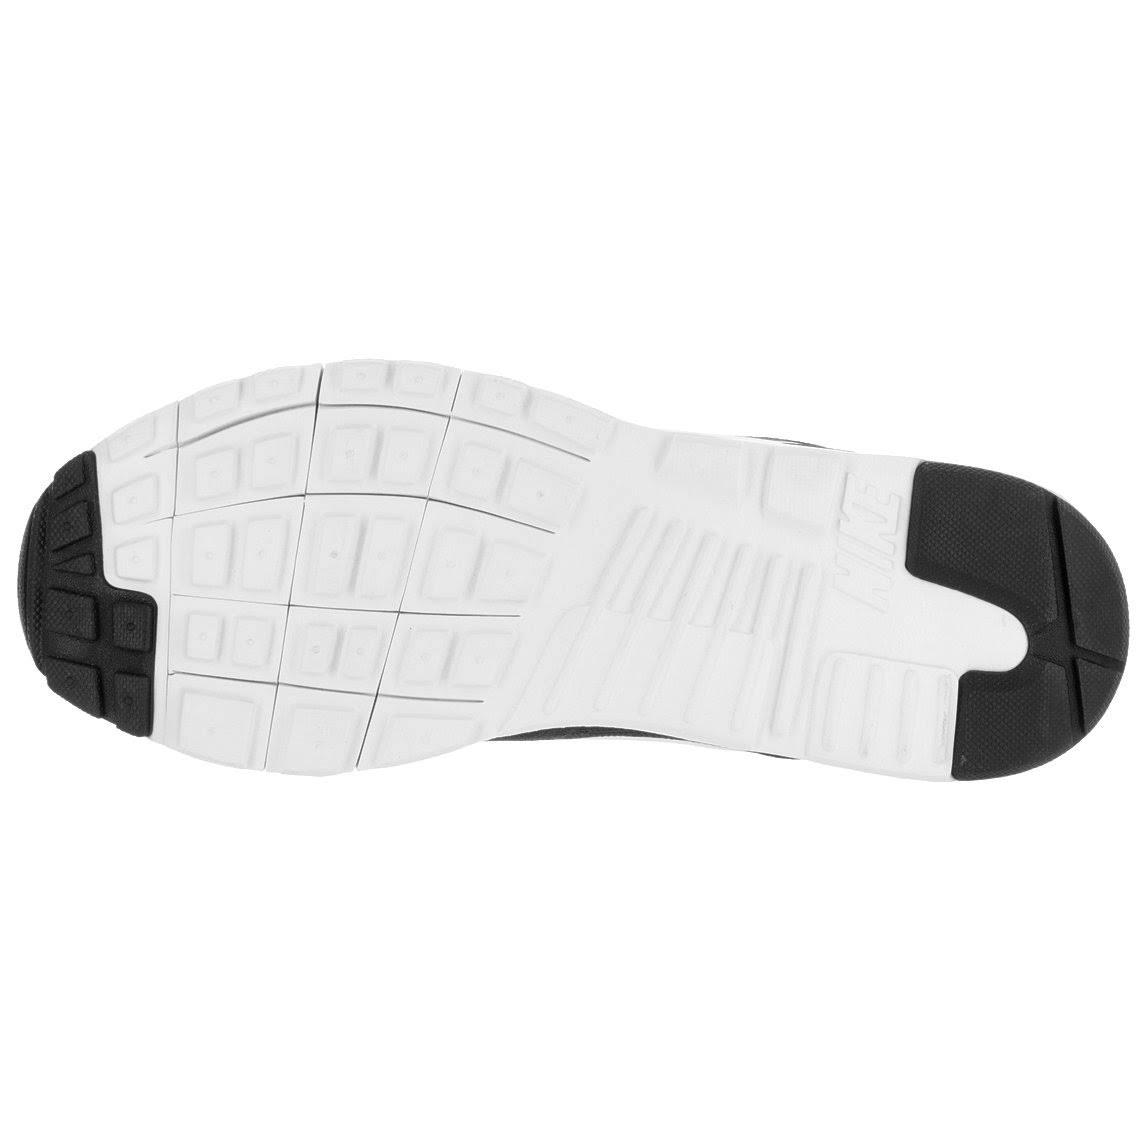 Style Tamaño Nike 814443 Tavas Big Max 7 Air Kids wBHSXqfH